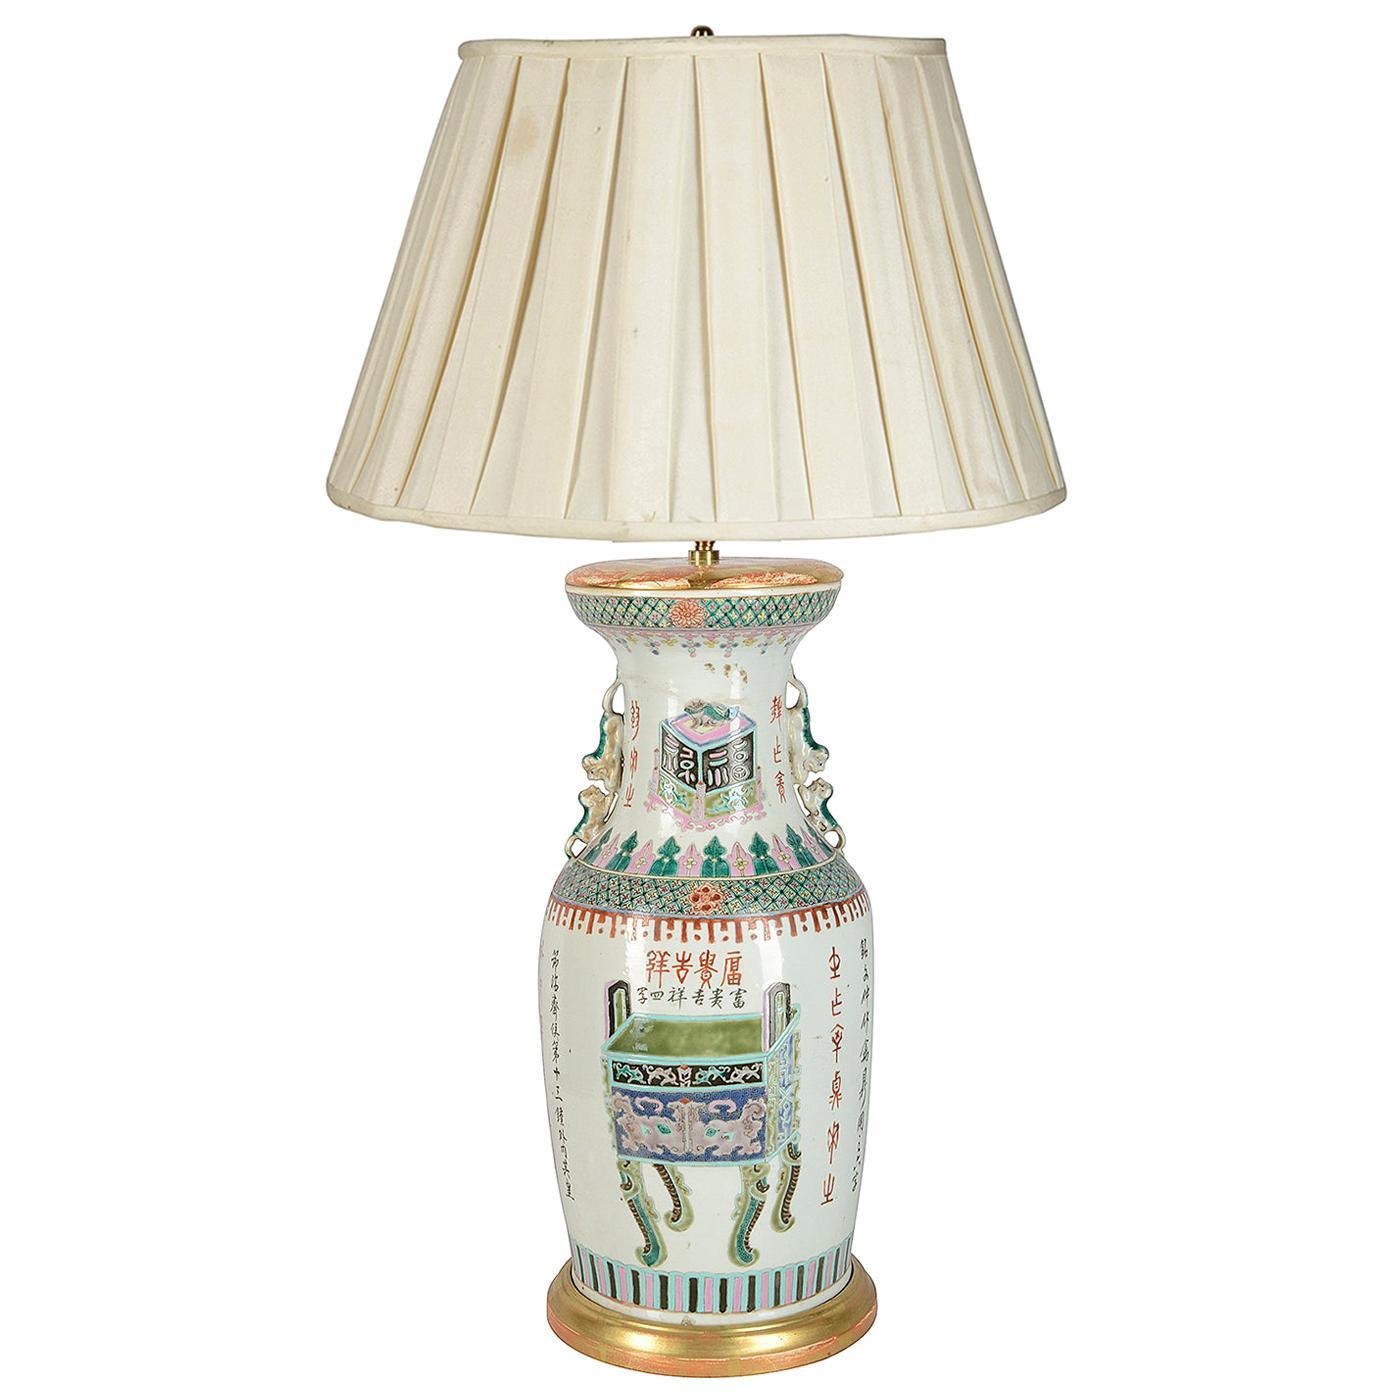 Late 19th Century Chinese Famille Verte Vase / Lamp